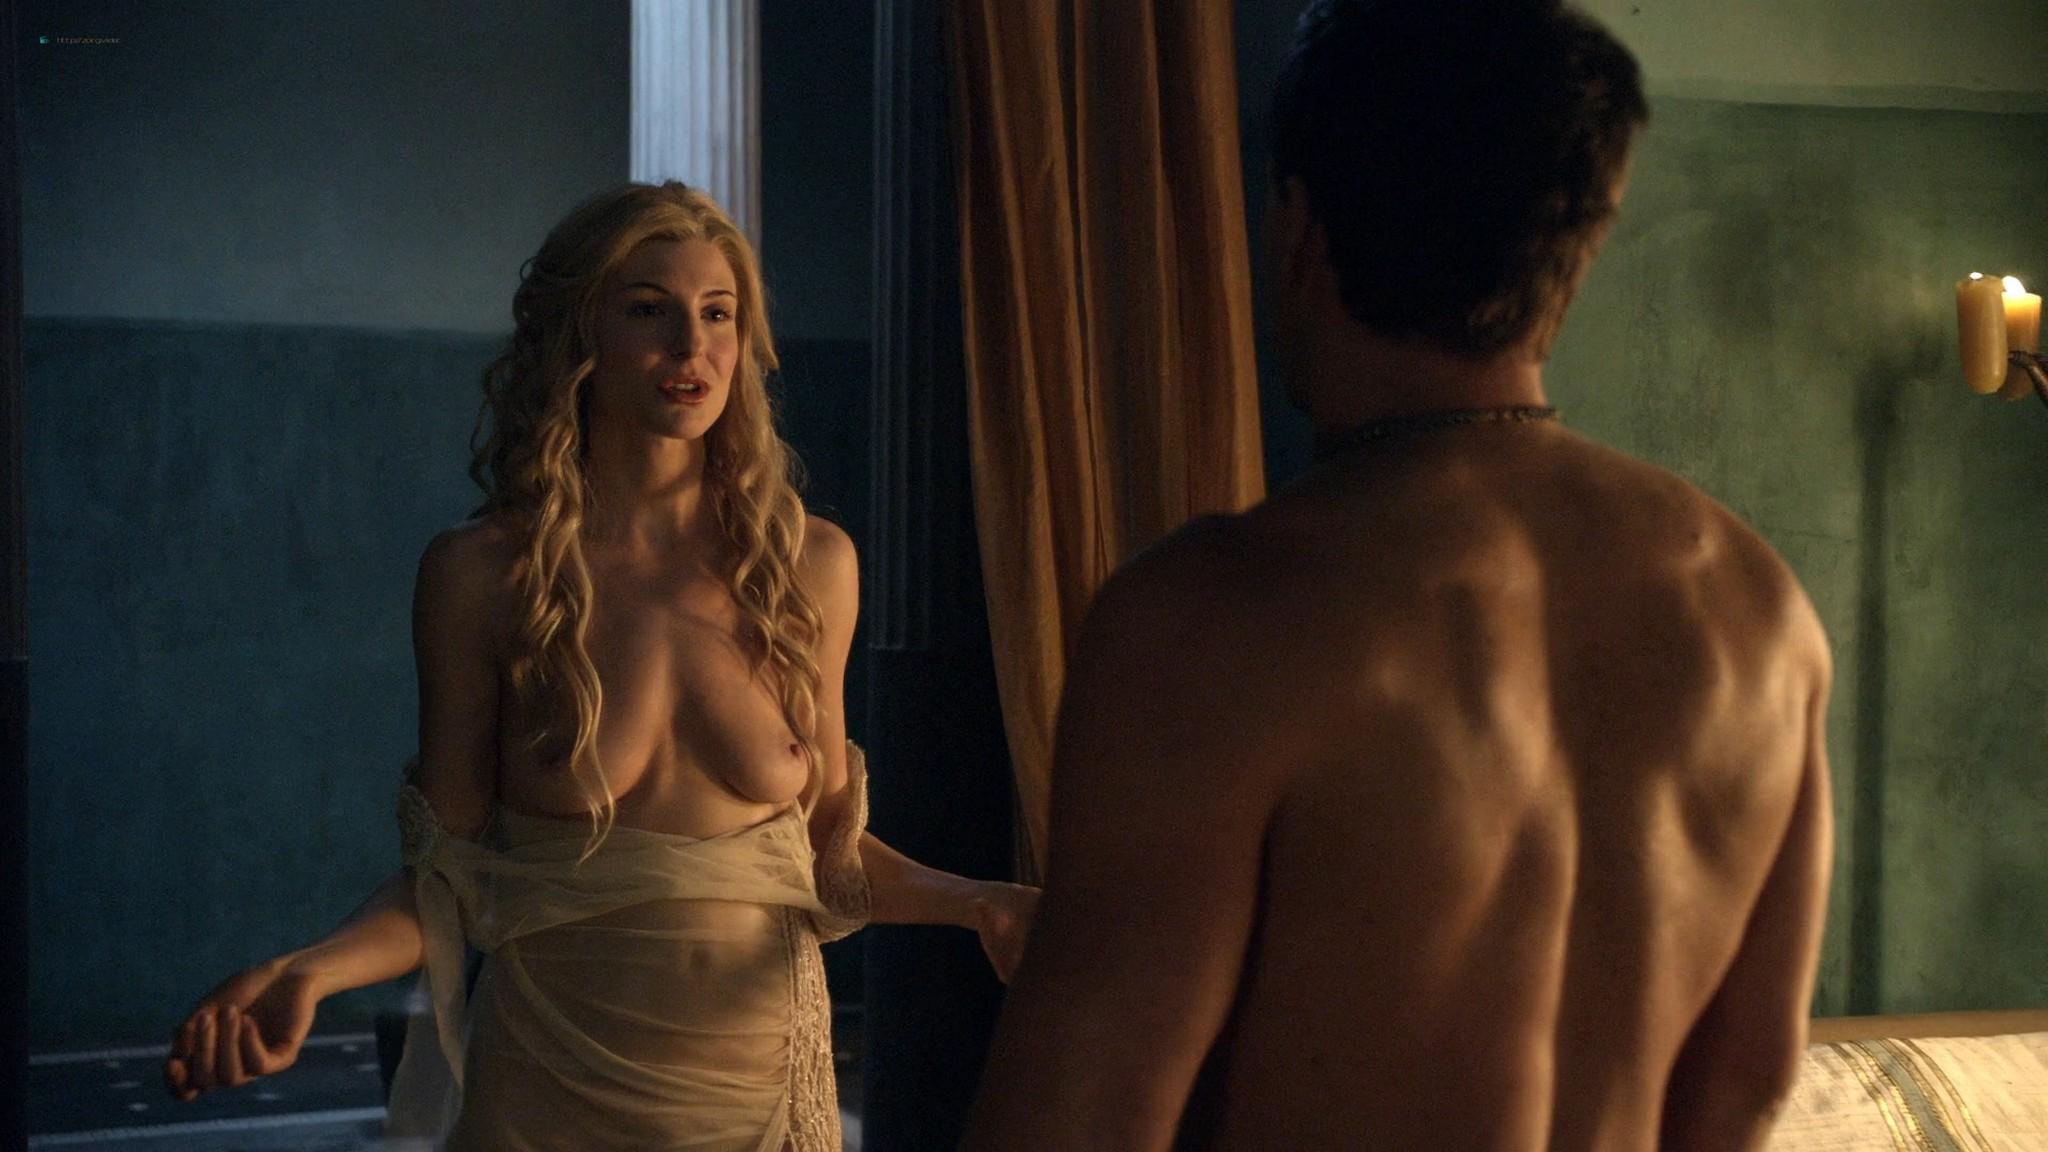 Viva Bianca nude topless Katrina Law, Bonnie Sveen, etc -Spartacus - Vengeance (2012) e3 1080p (14)